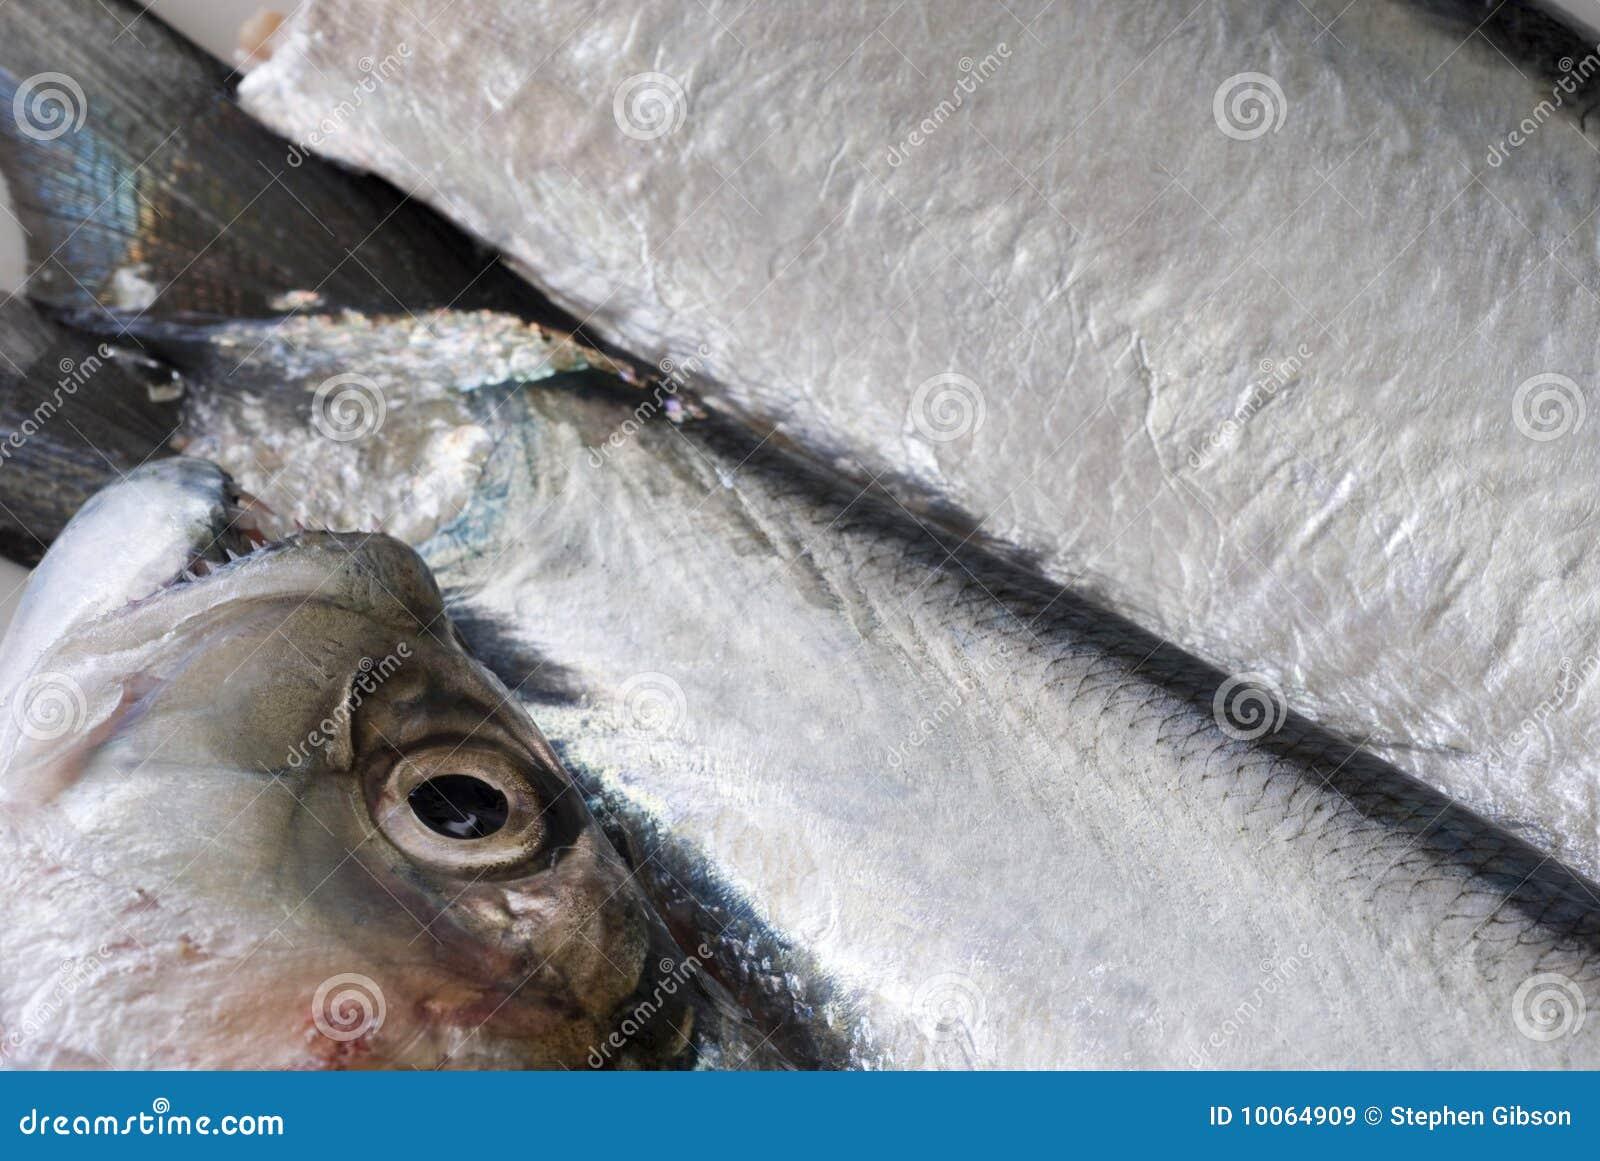 Peixes frescos